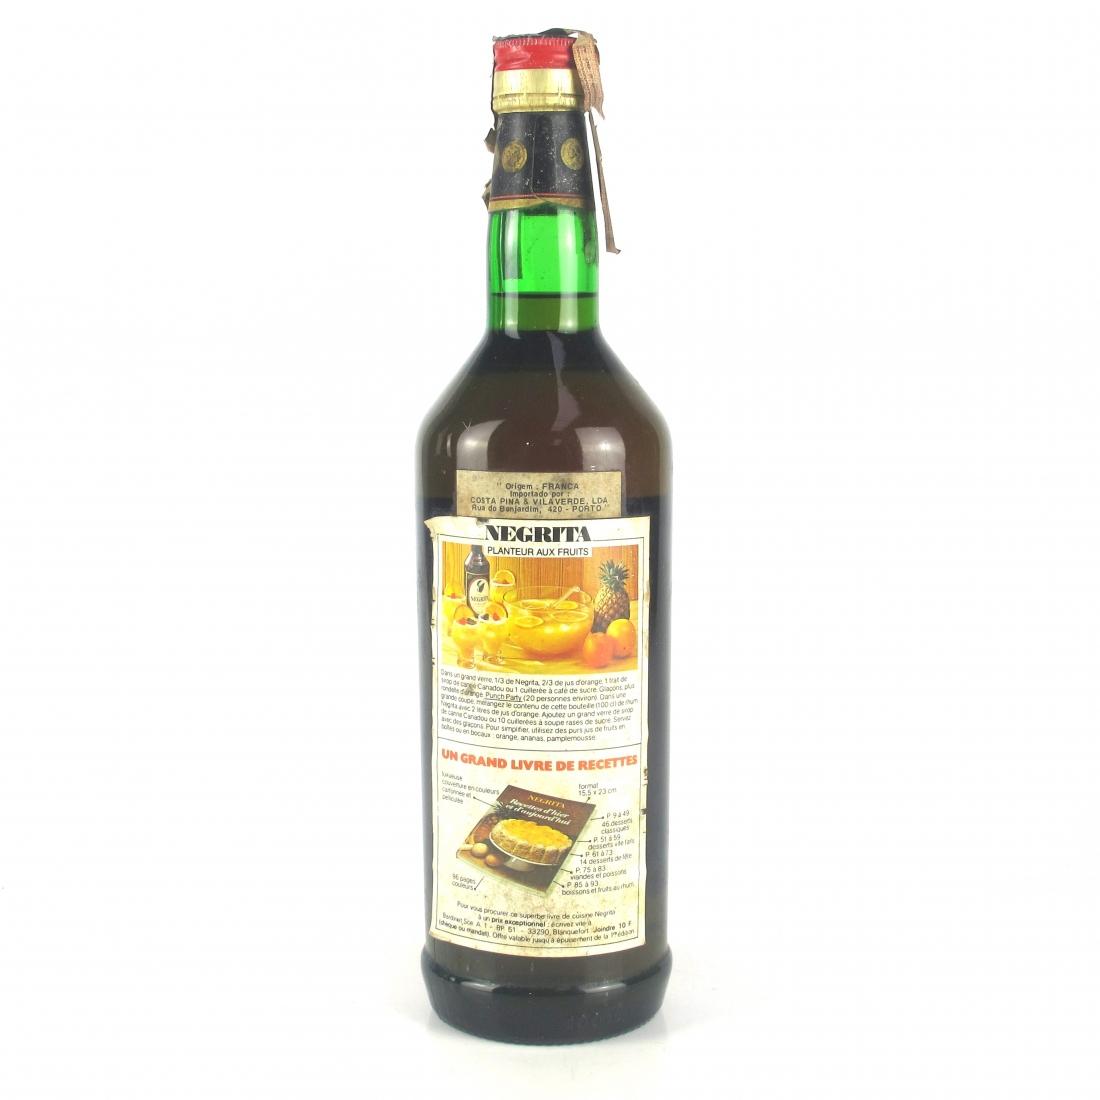 Negrita Bardinet Original Caribbean Rum 1 Litre 1960s